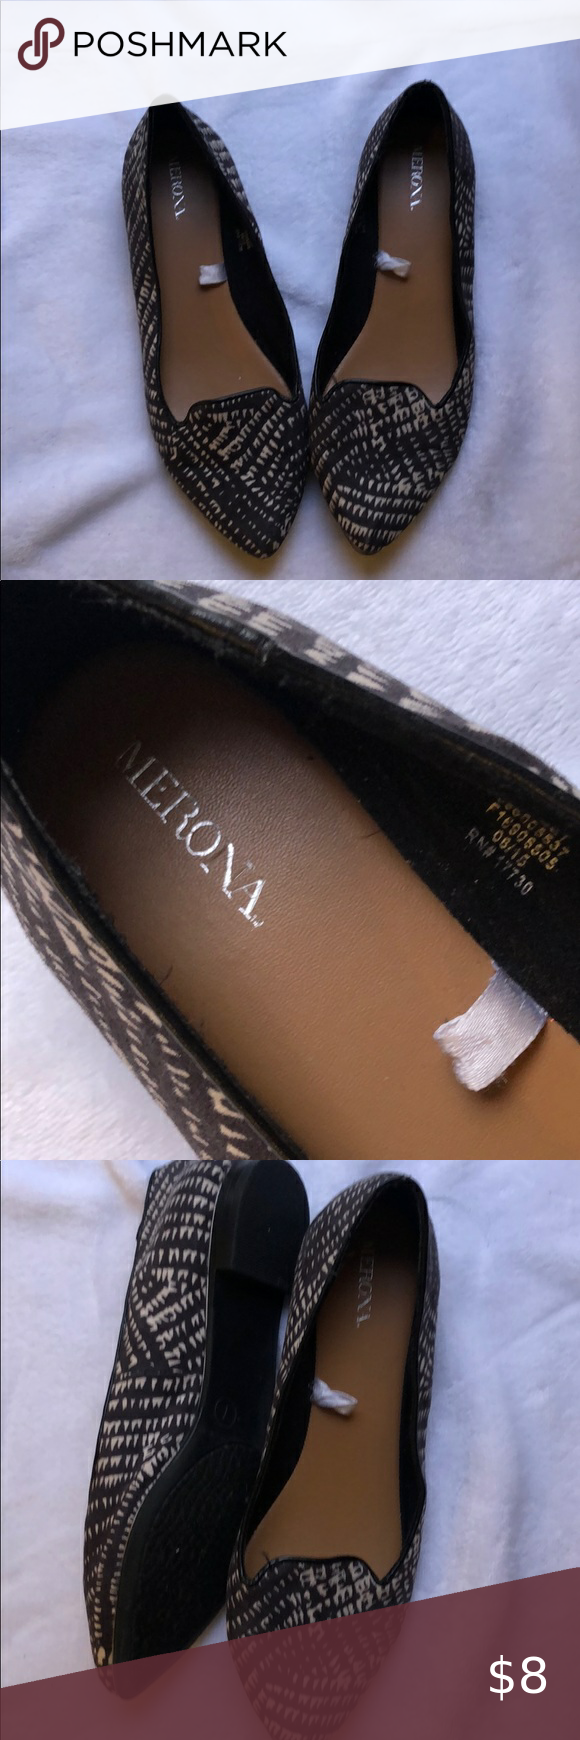 Merona shoes in 2020 | Shoes, Merona